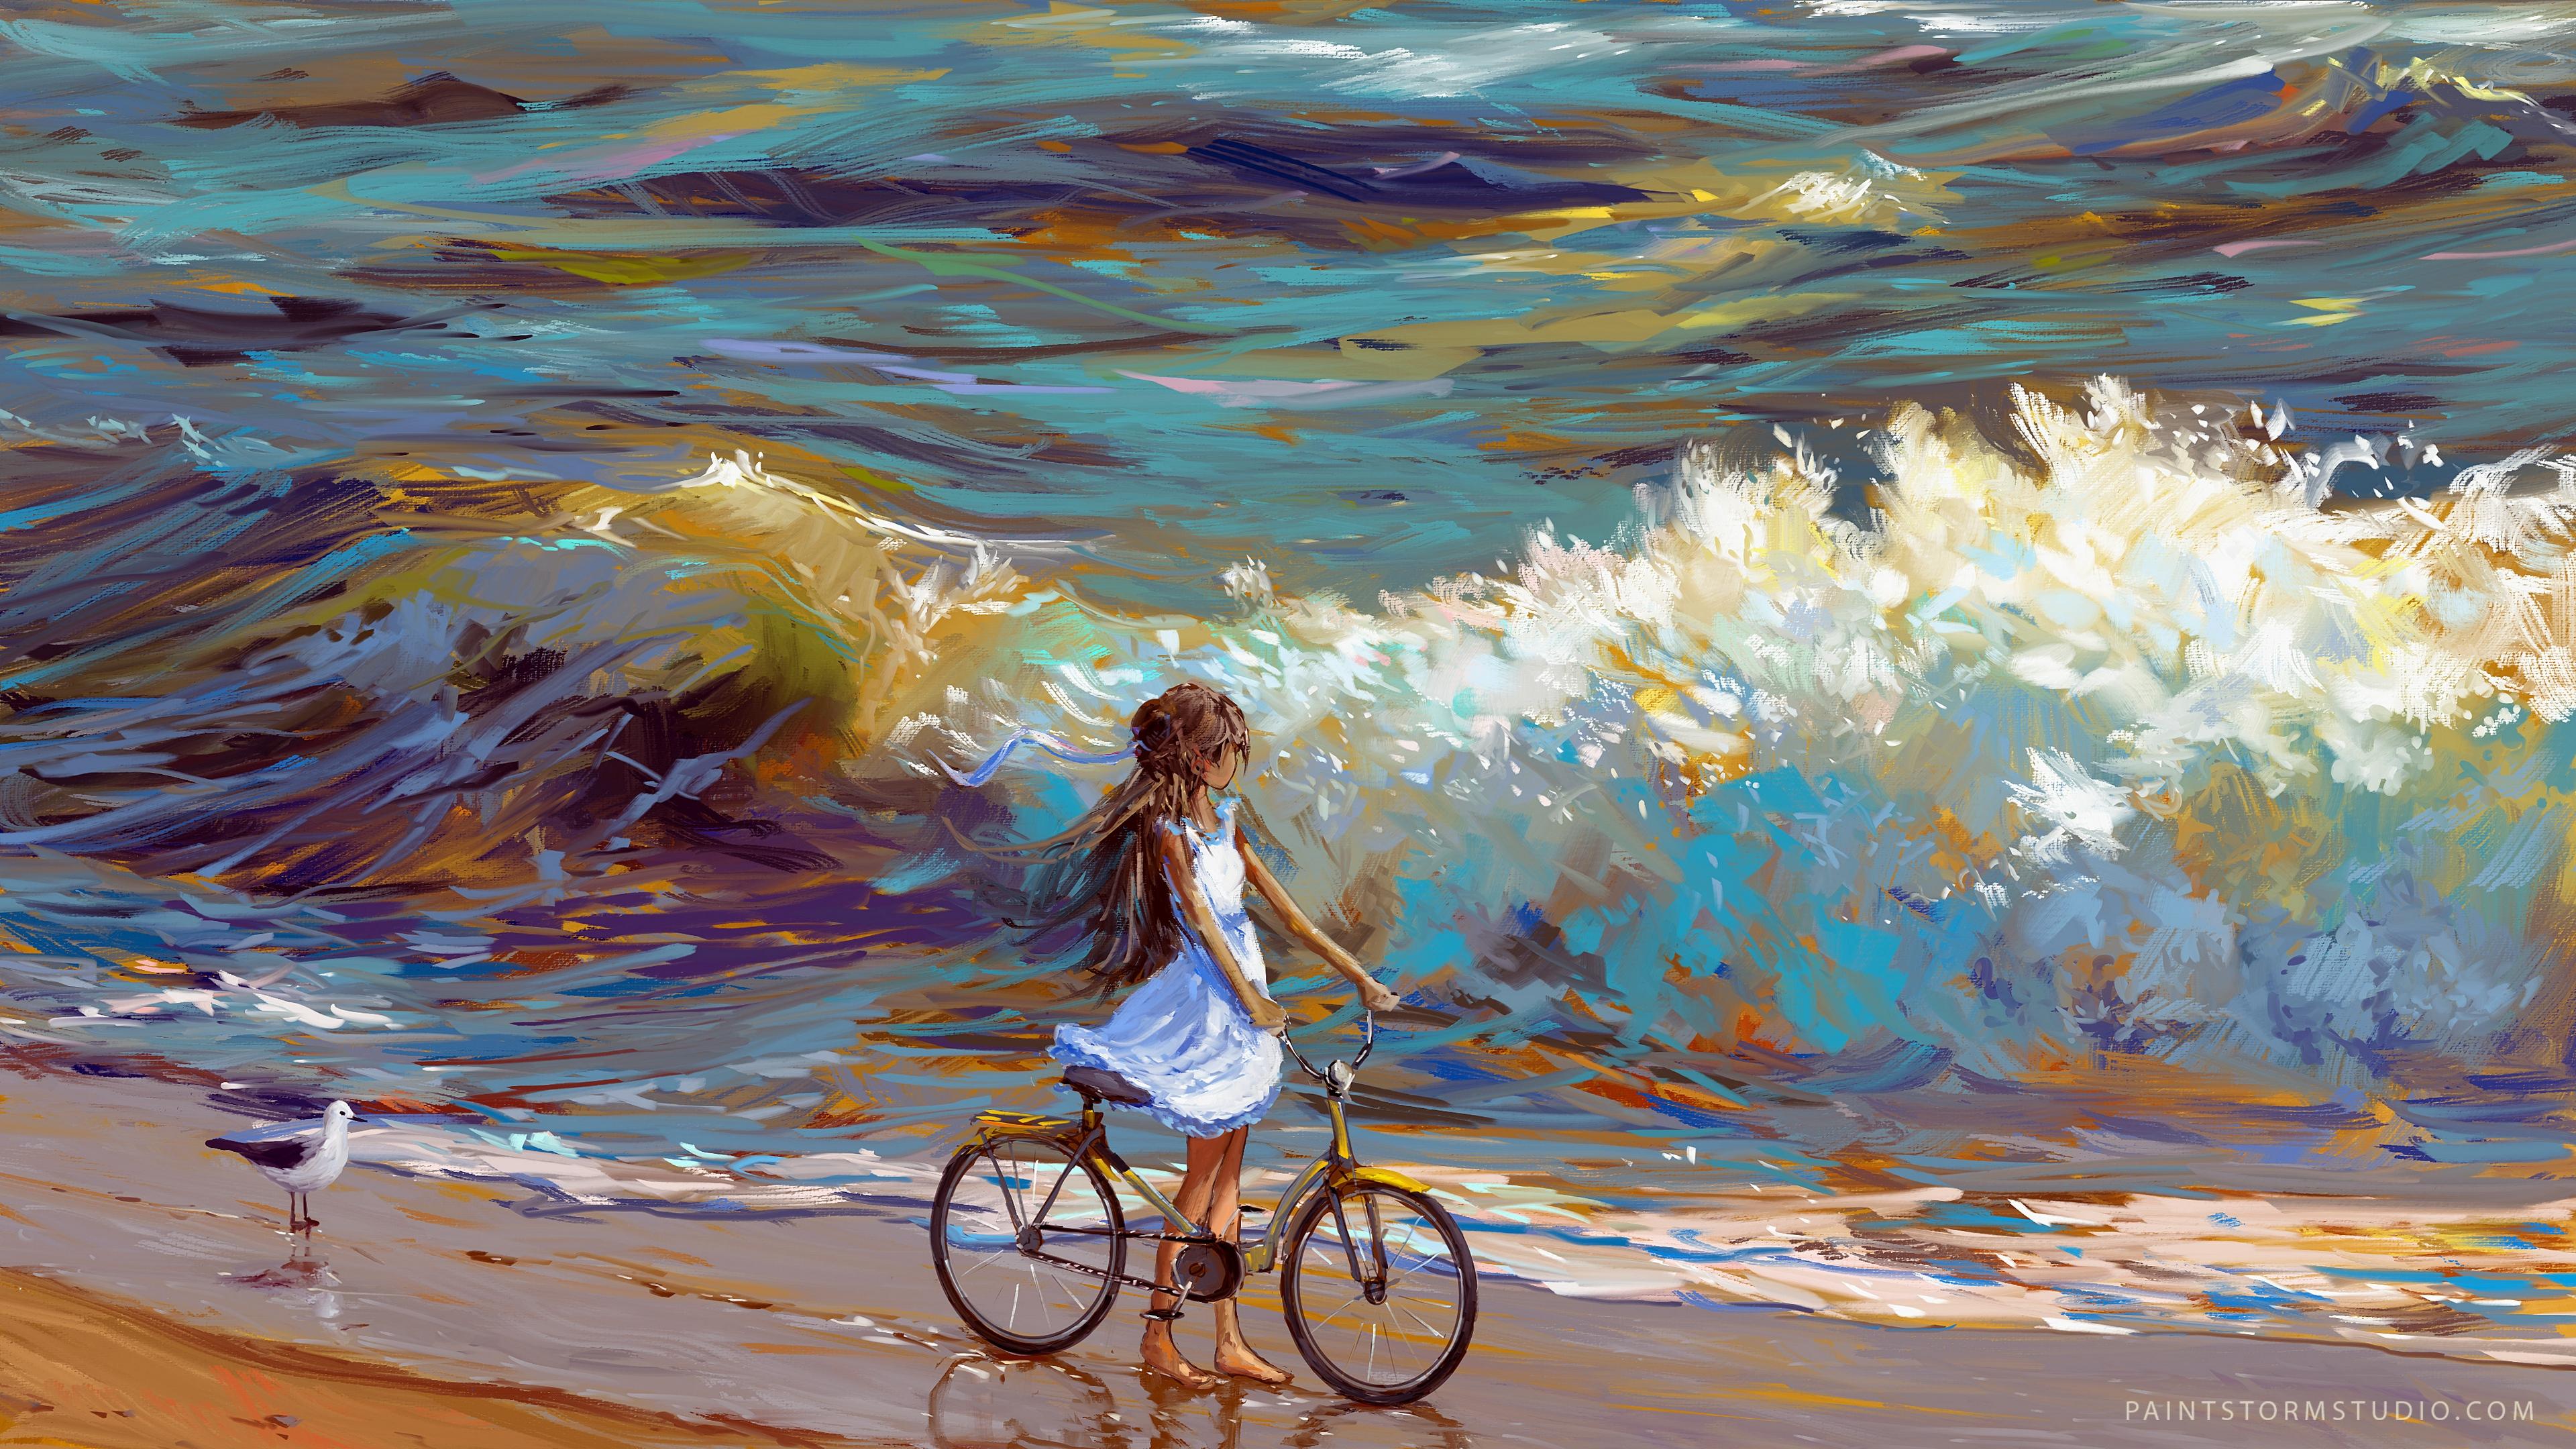 cyclist bicycle child art sea shore 4k 1541971592 - cyclist, bicycle, child, art, sea, shore 4k - cyclist, child, Bicycle